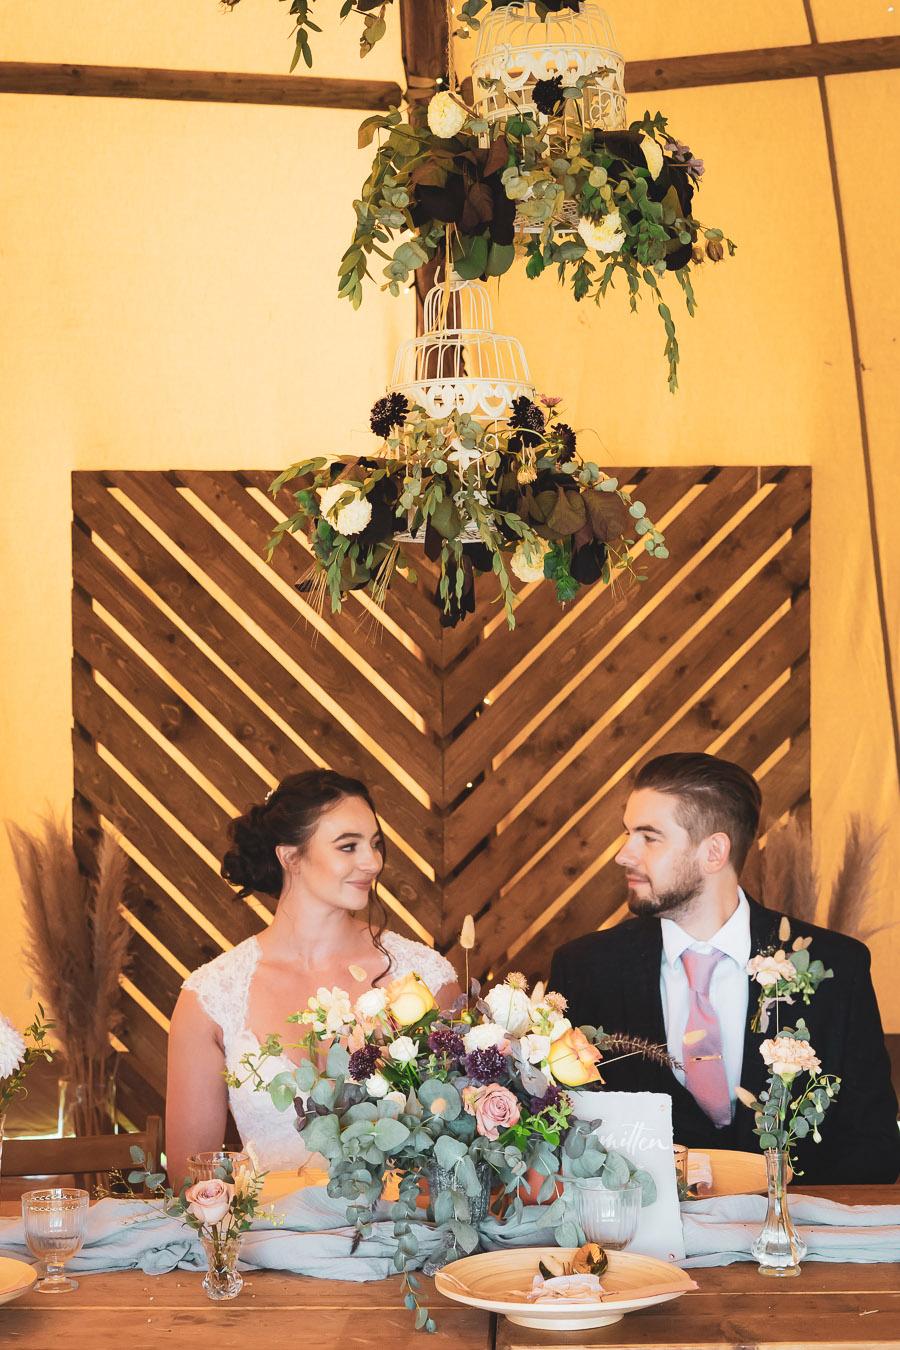 Sophisticated Boho - The New Intimate Wedding (17)